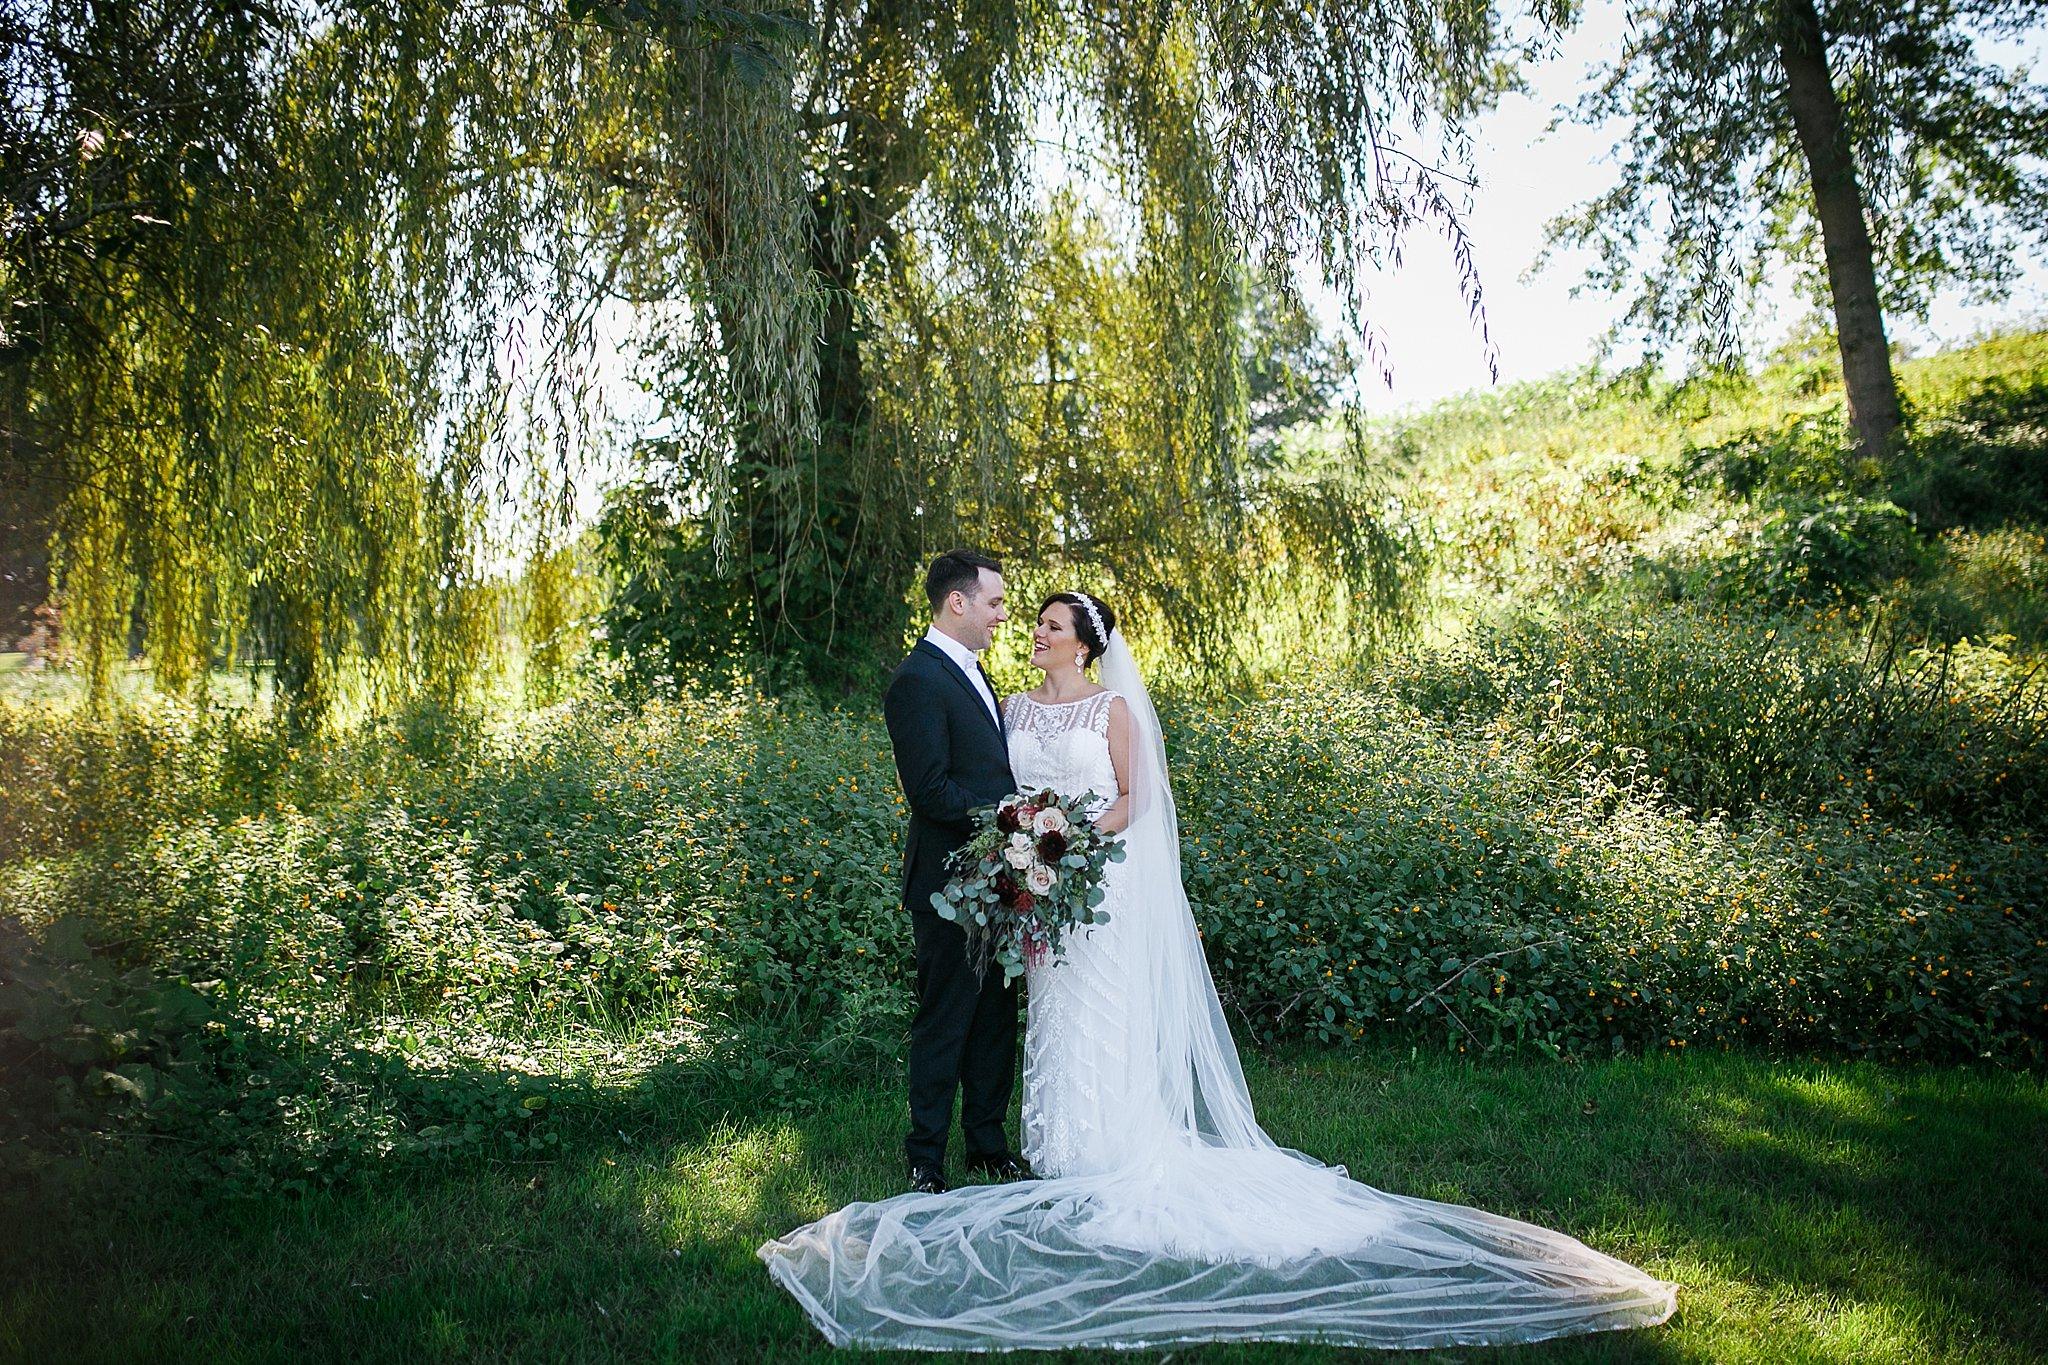 West Hills Country Club Wedding Gatsby Wedding Roaring Twenties Wedding Hudson Valley Wedding Photographer Sweet Alice Photography36.jpg